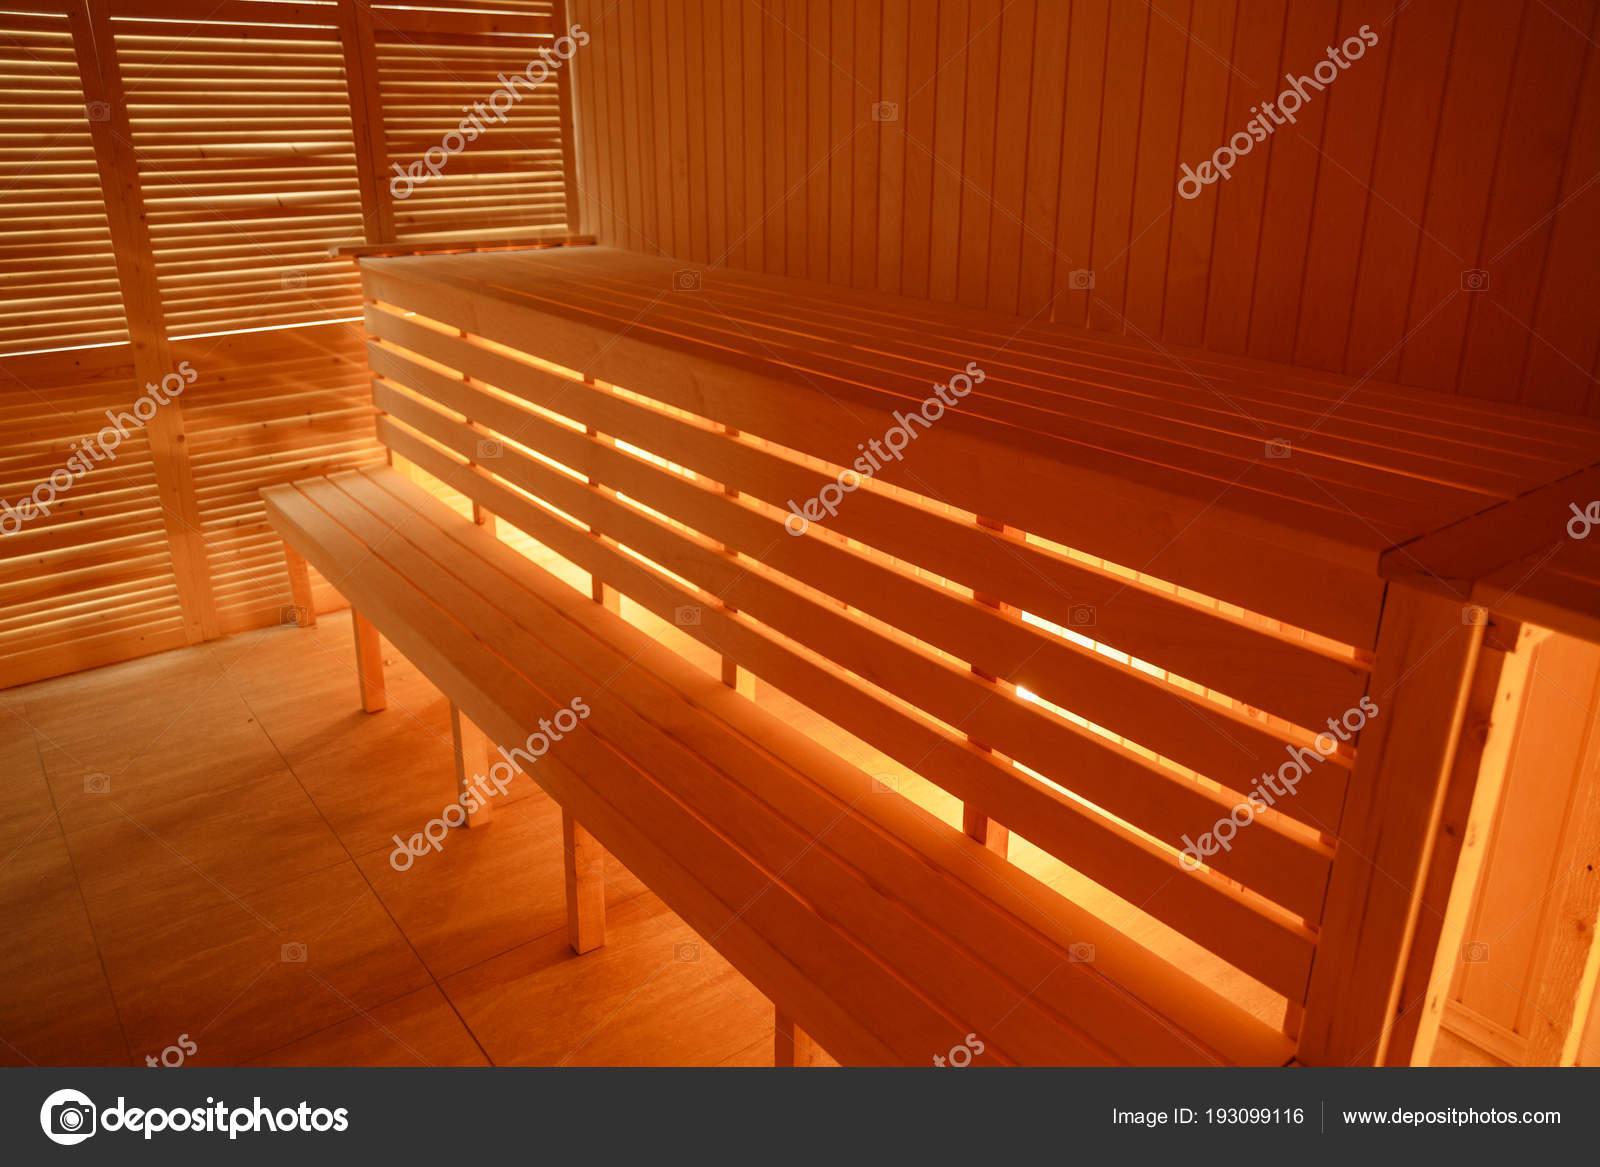 Interieur Klein Huis : Interieur klein huis houten sauna u stockfoto lizaelesina